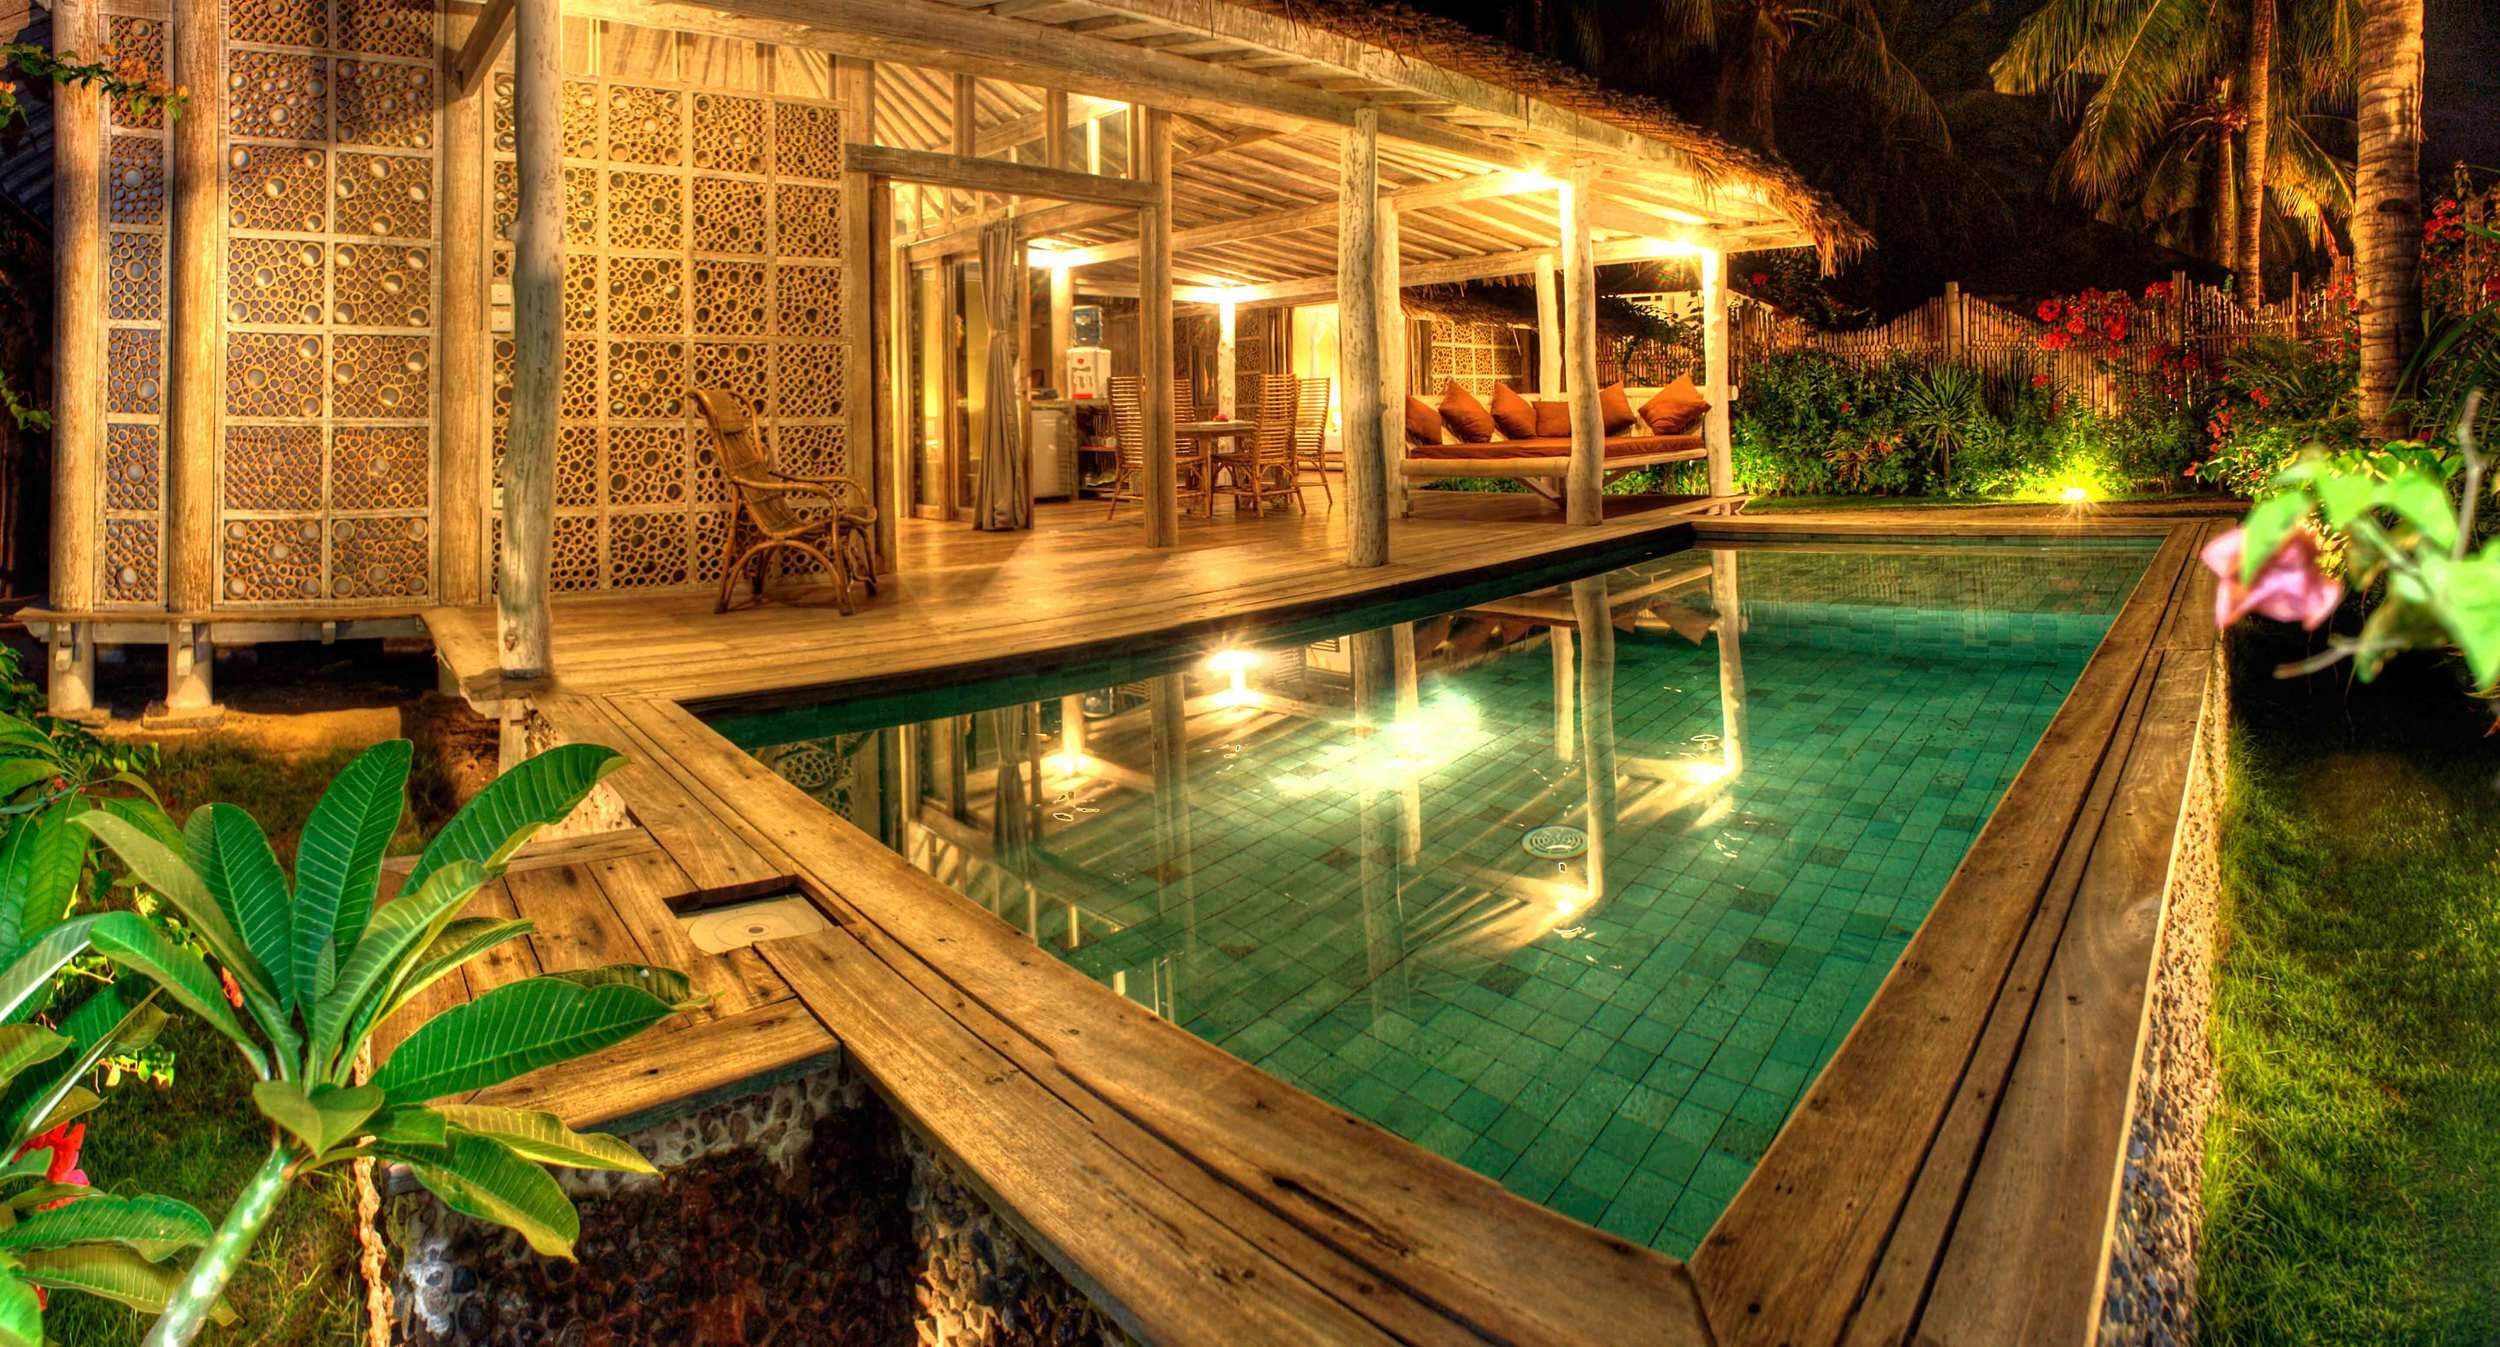 Villa deluxe 2 bedrooms by night Gili island